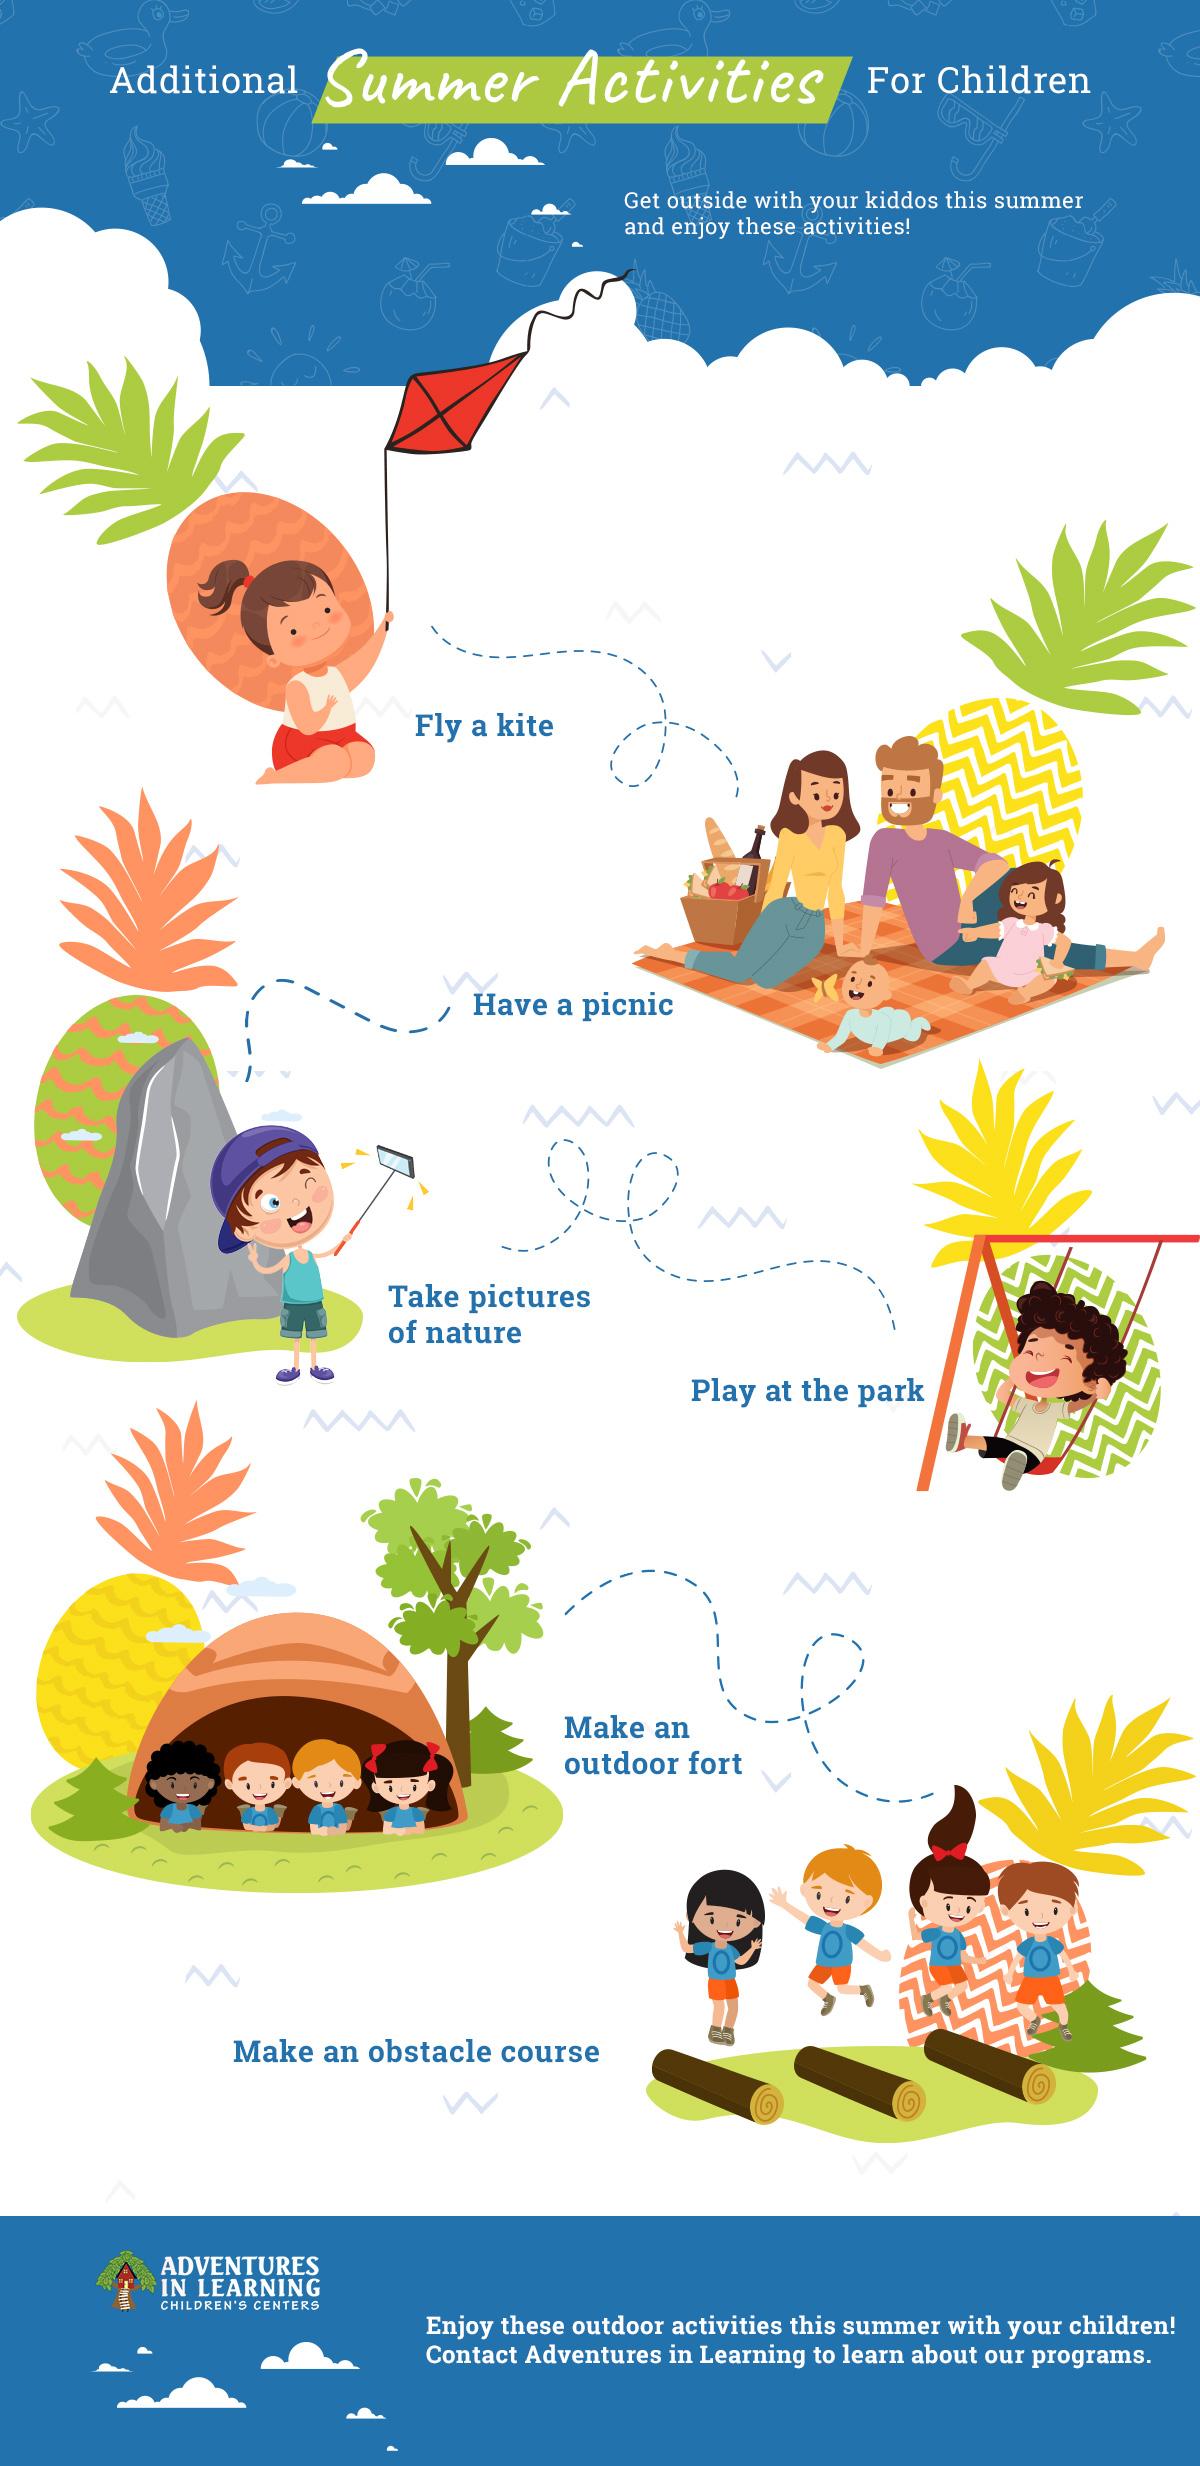 Additional Summer Activities for Children